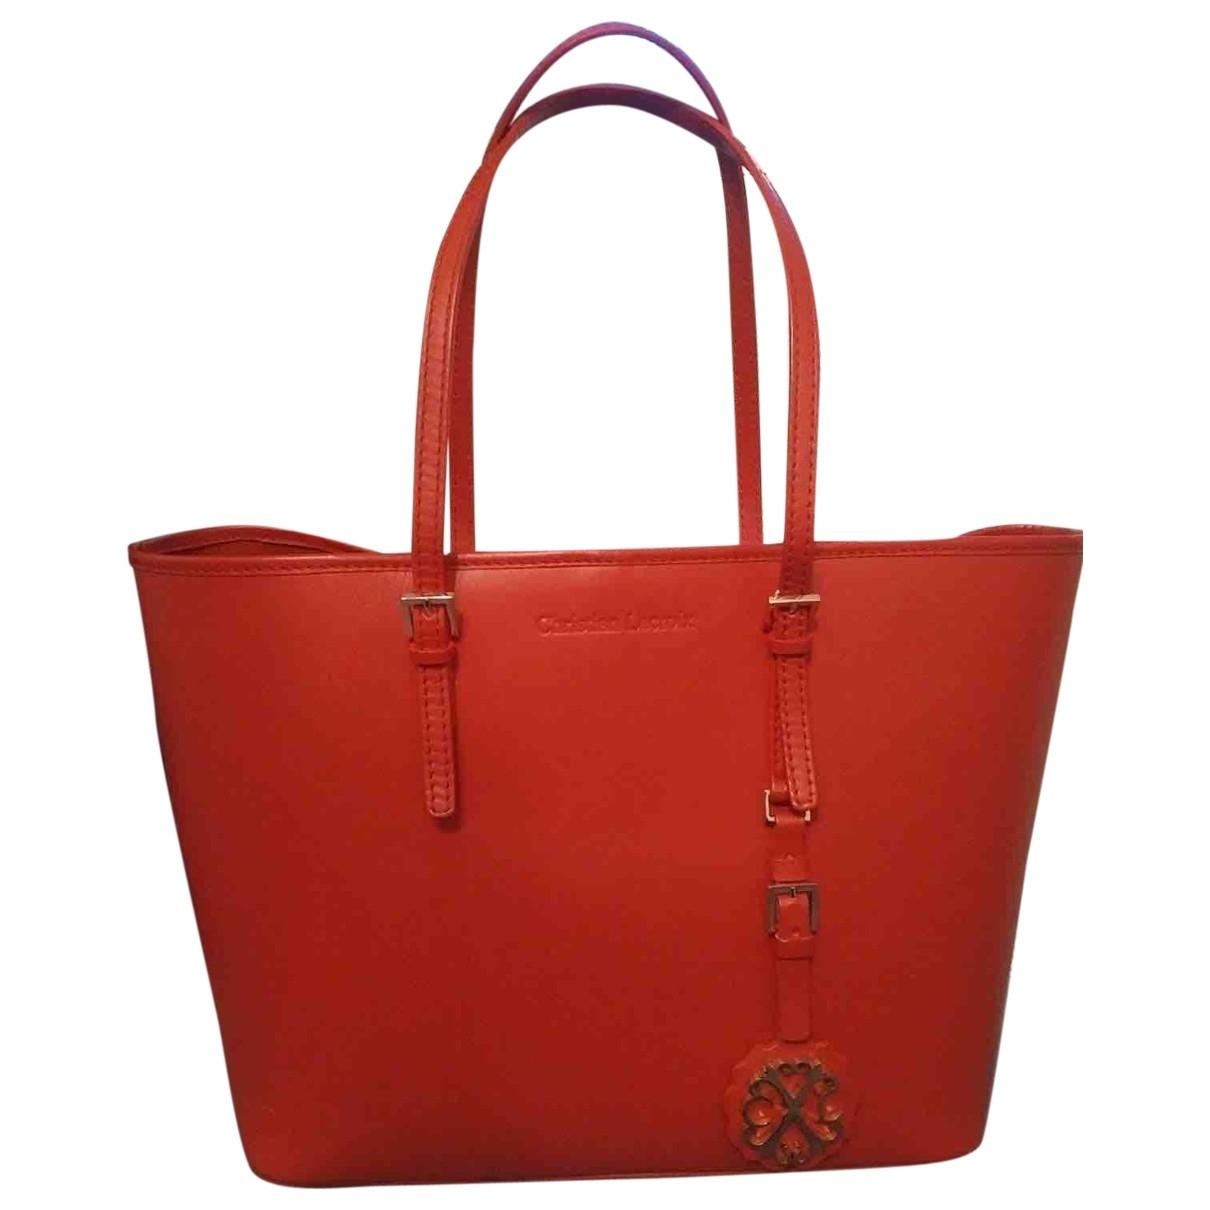 Christian Lacroix \N Red Leather handbag for Women \N